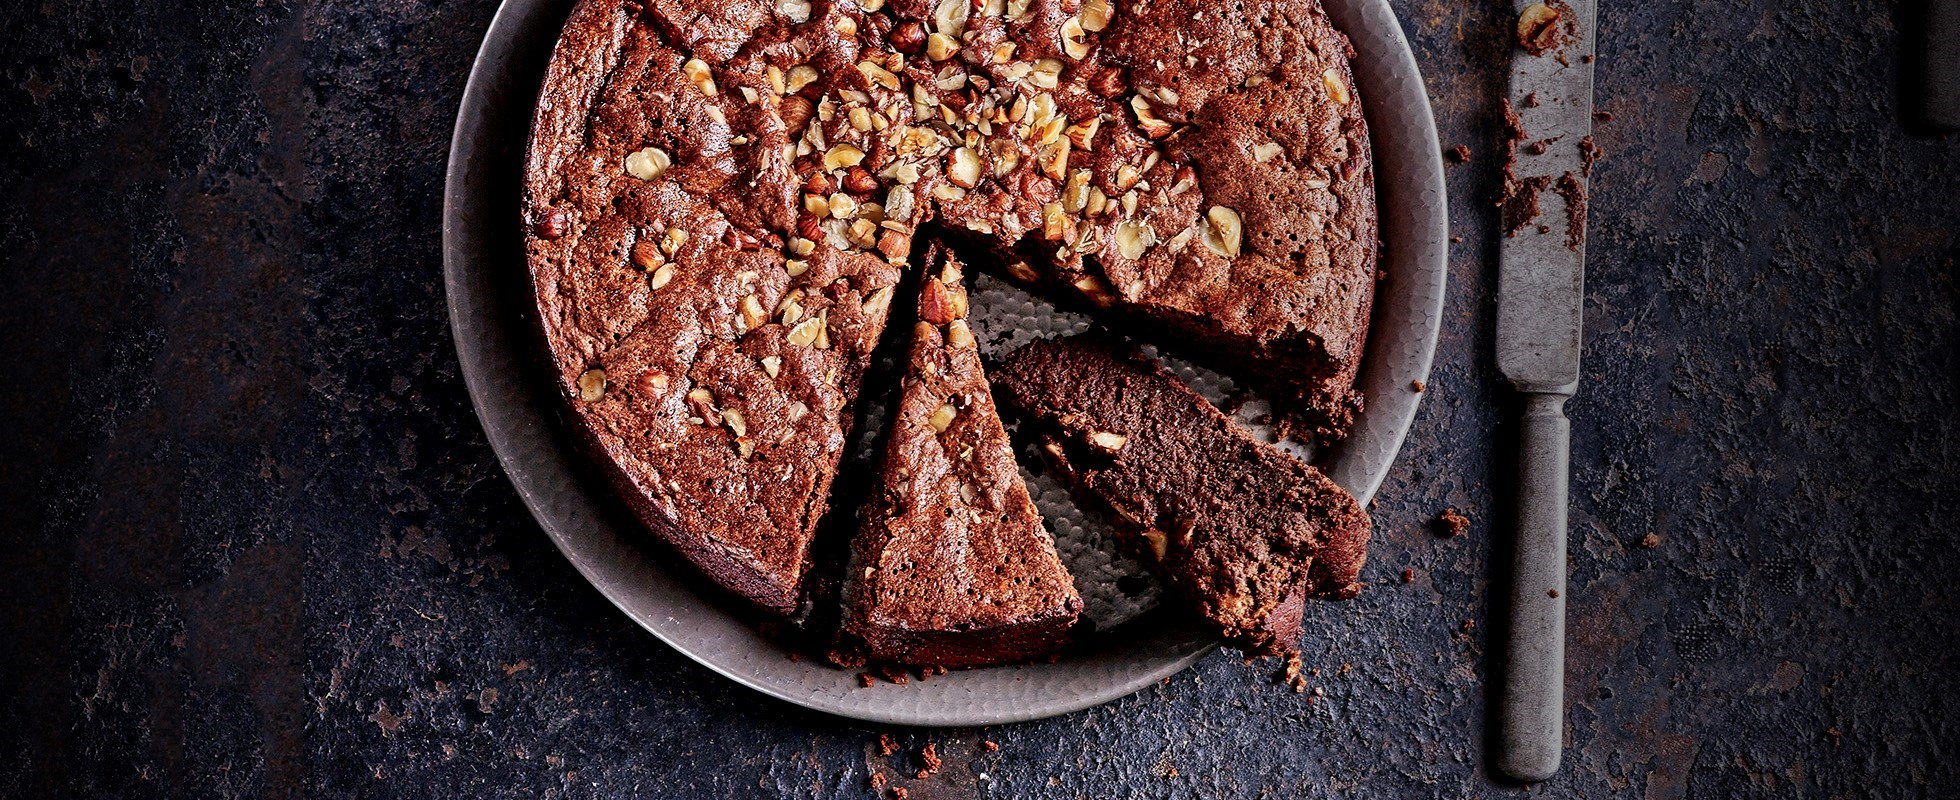 sunken nutella cake